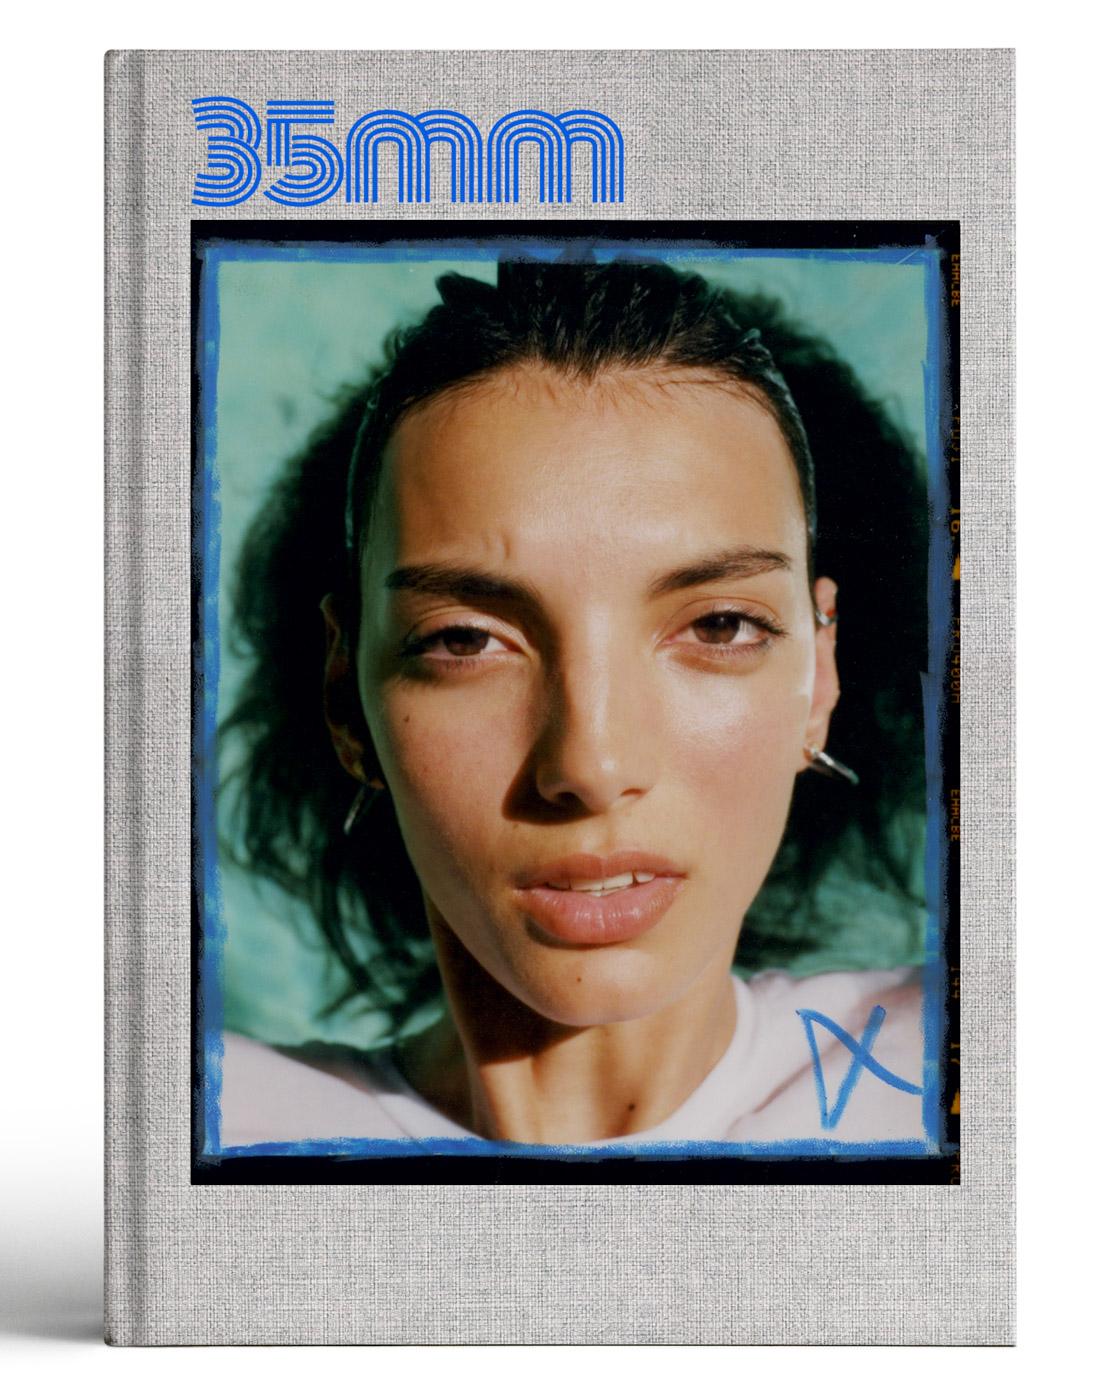 35mm_magazine_book_issue_film_only04.jpg